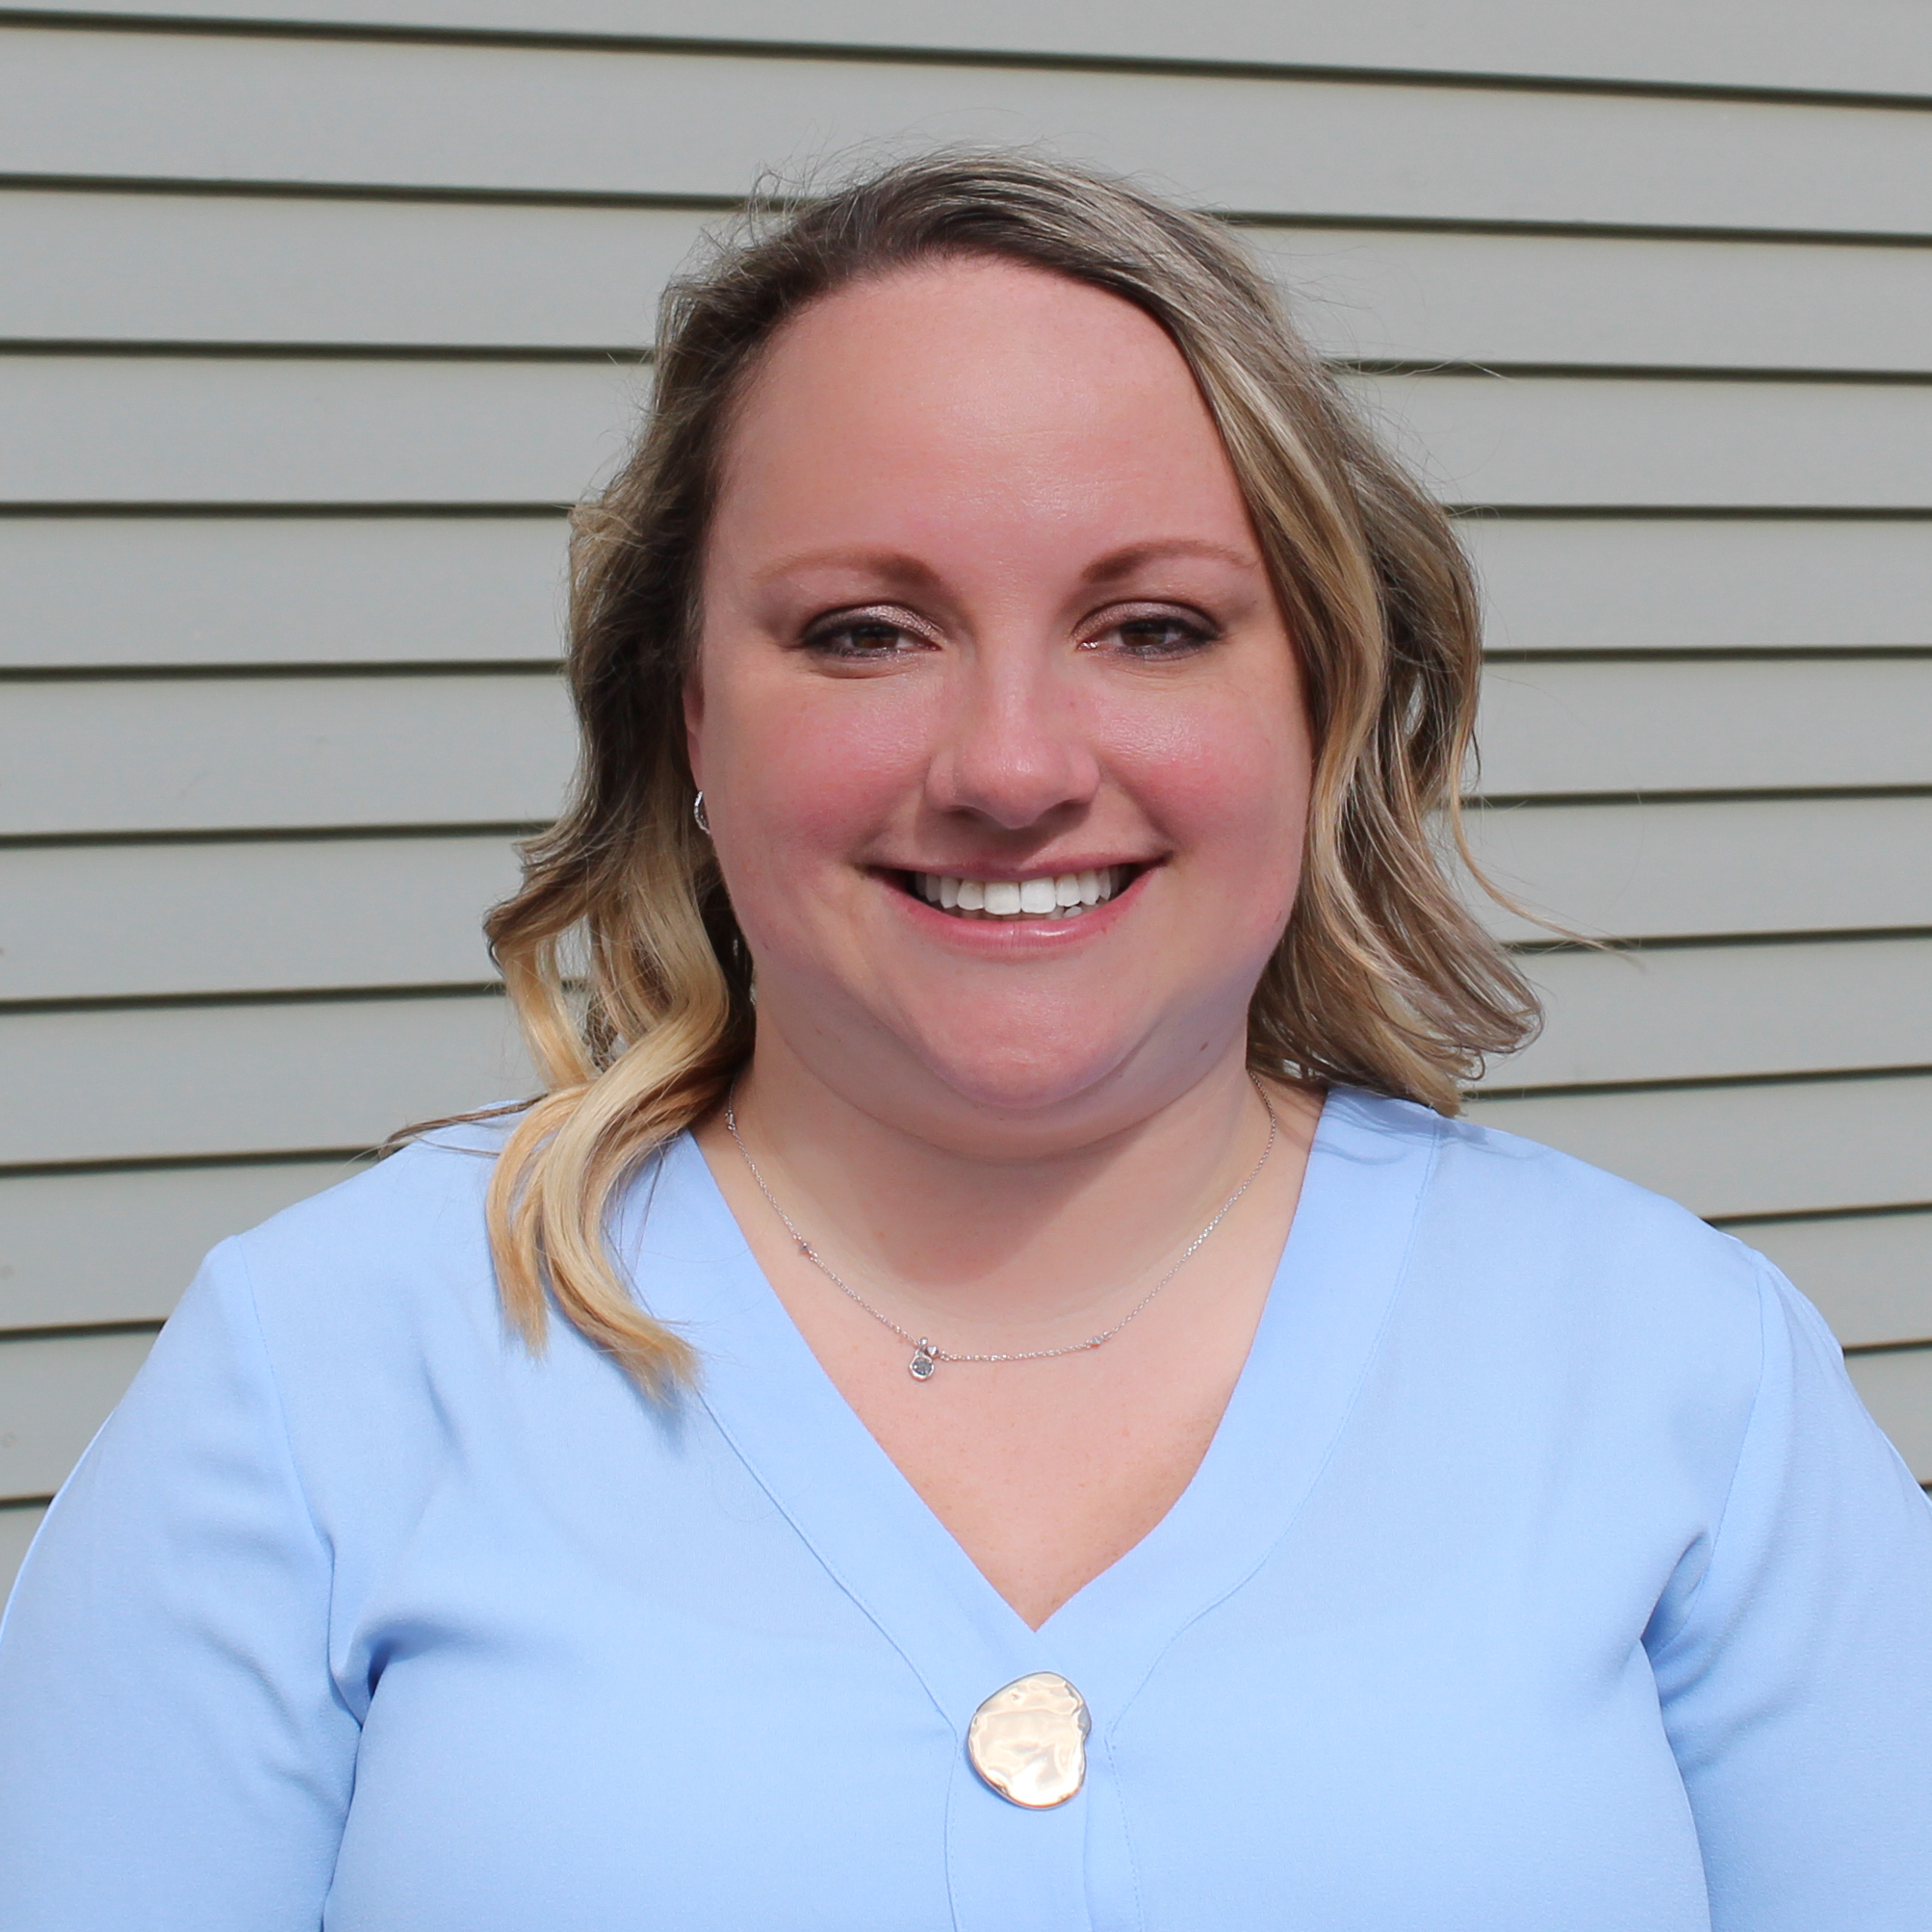 Samantha Hicks, MA, LCPC, CADC